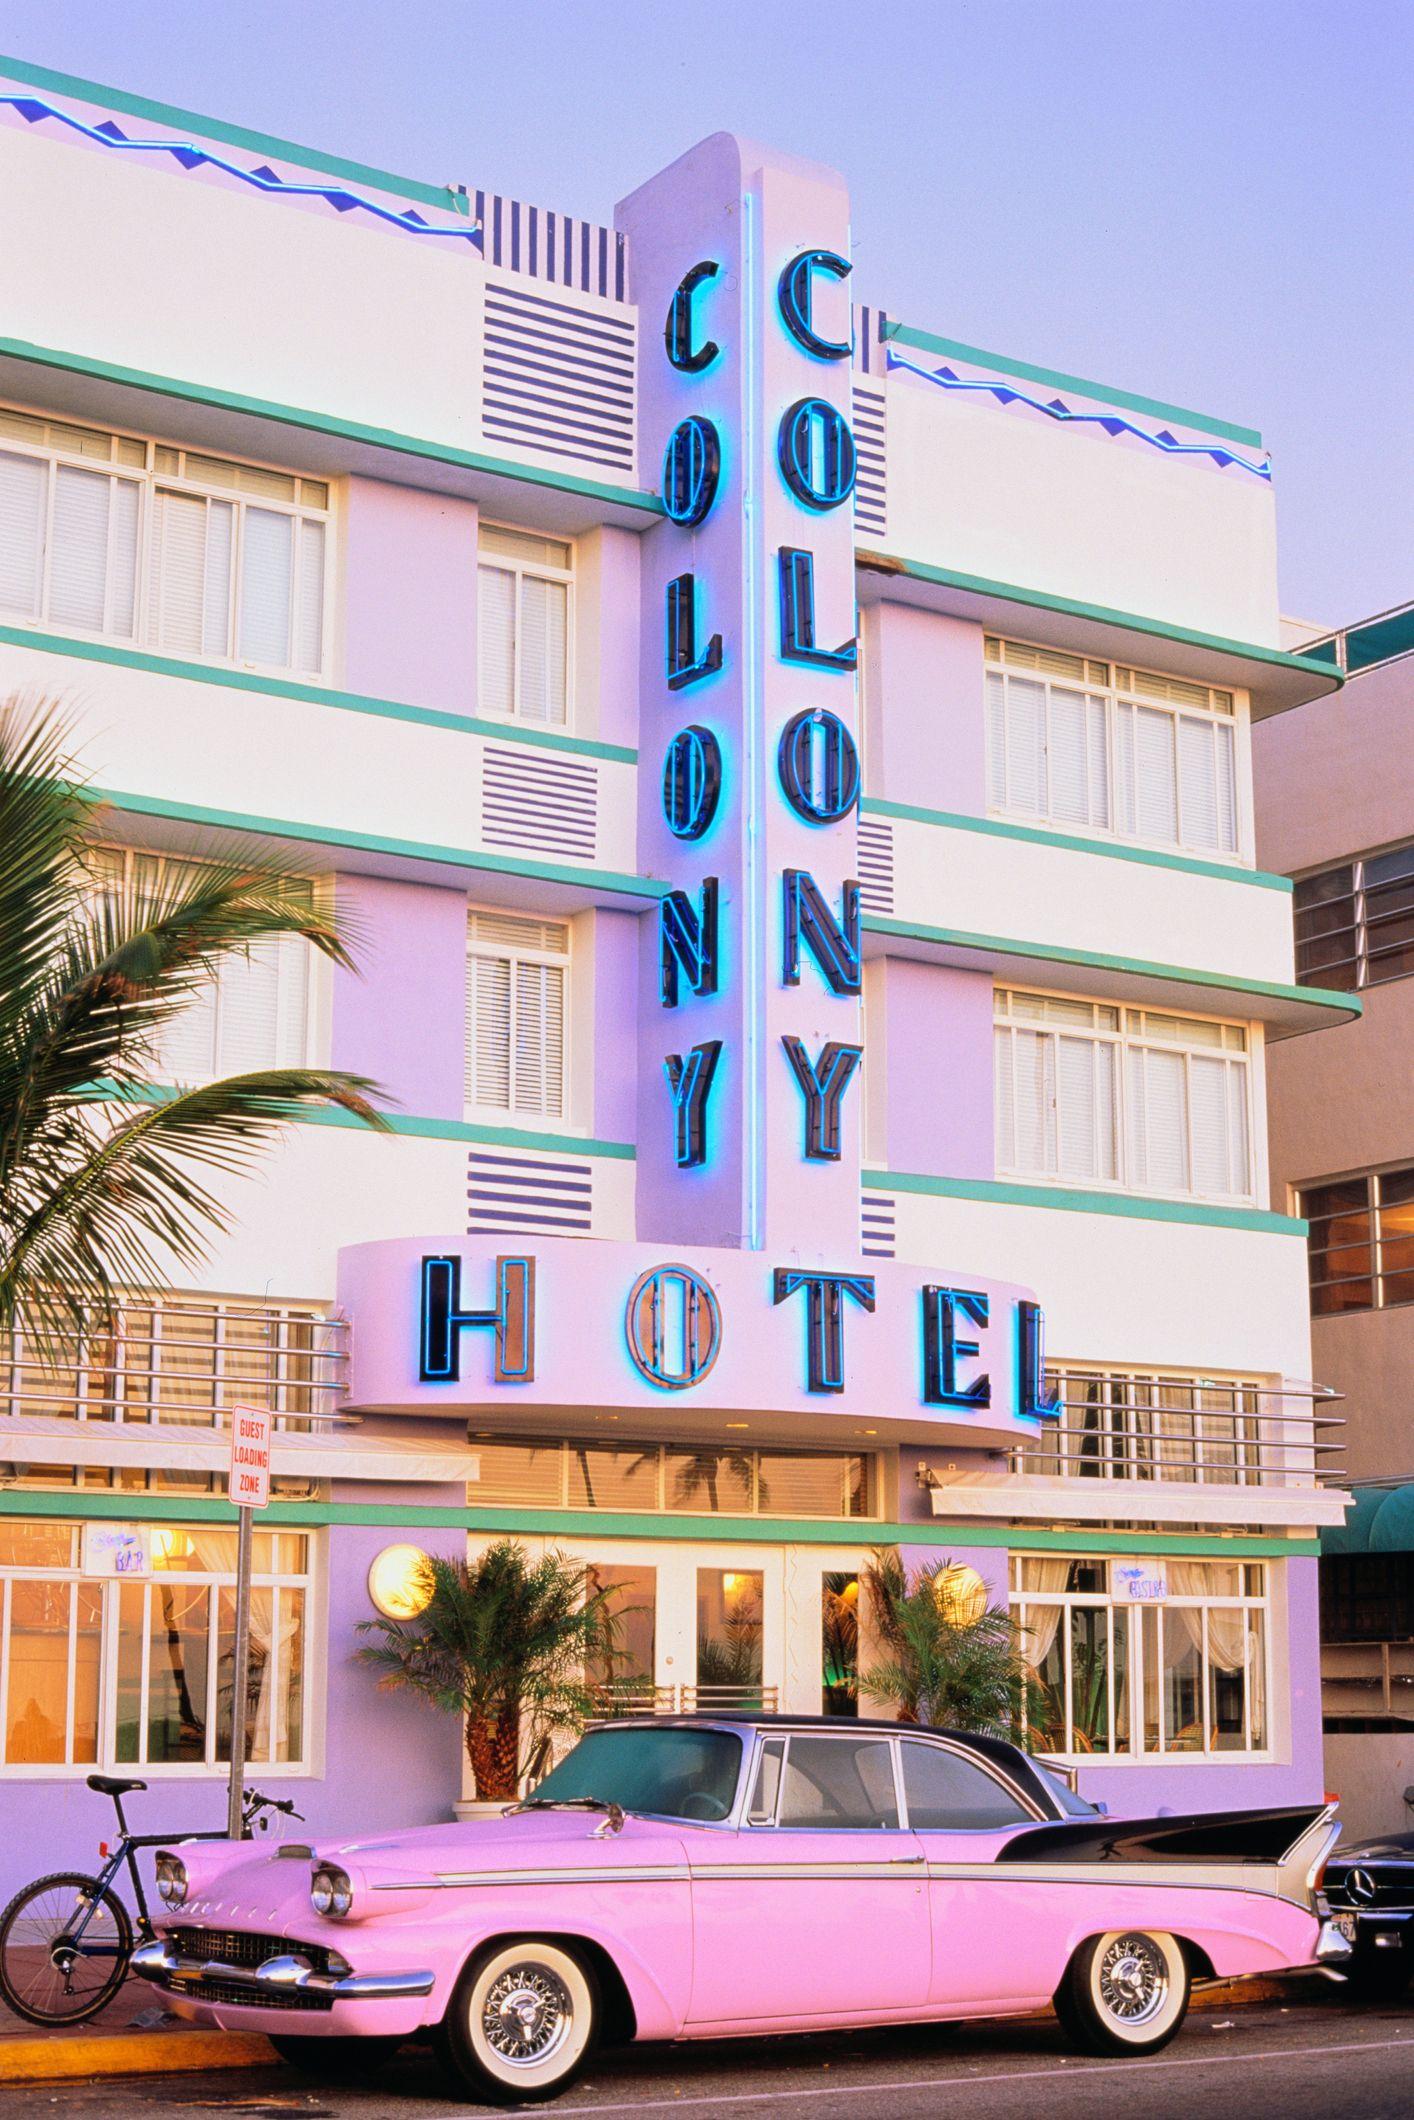 USA, Florida, Miami Beach, classic car outside Art Deco hotel